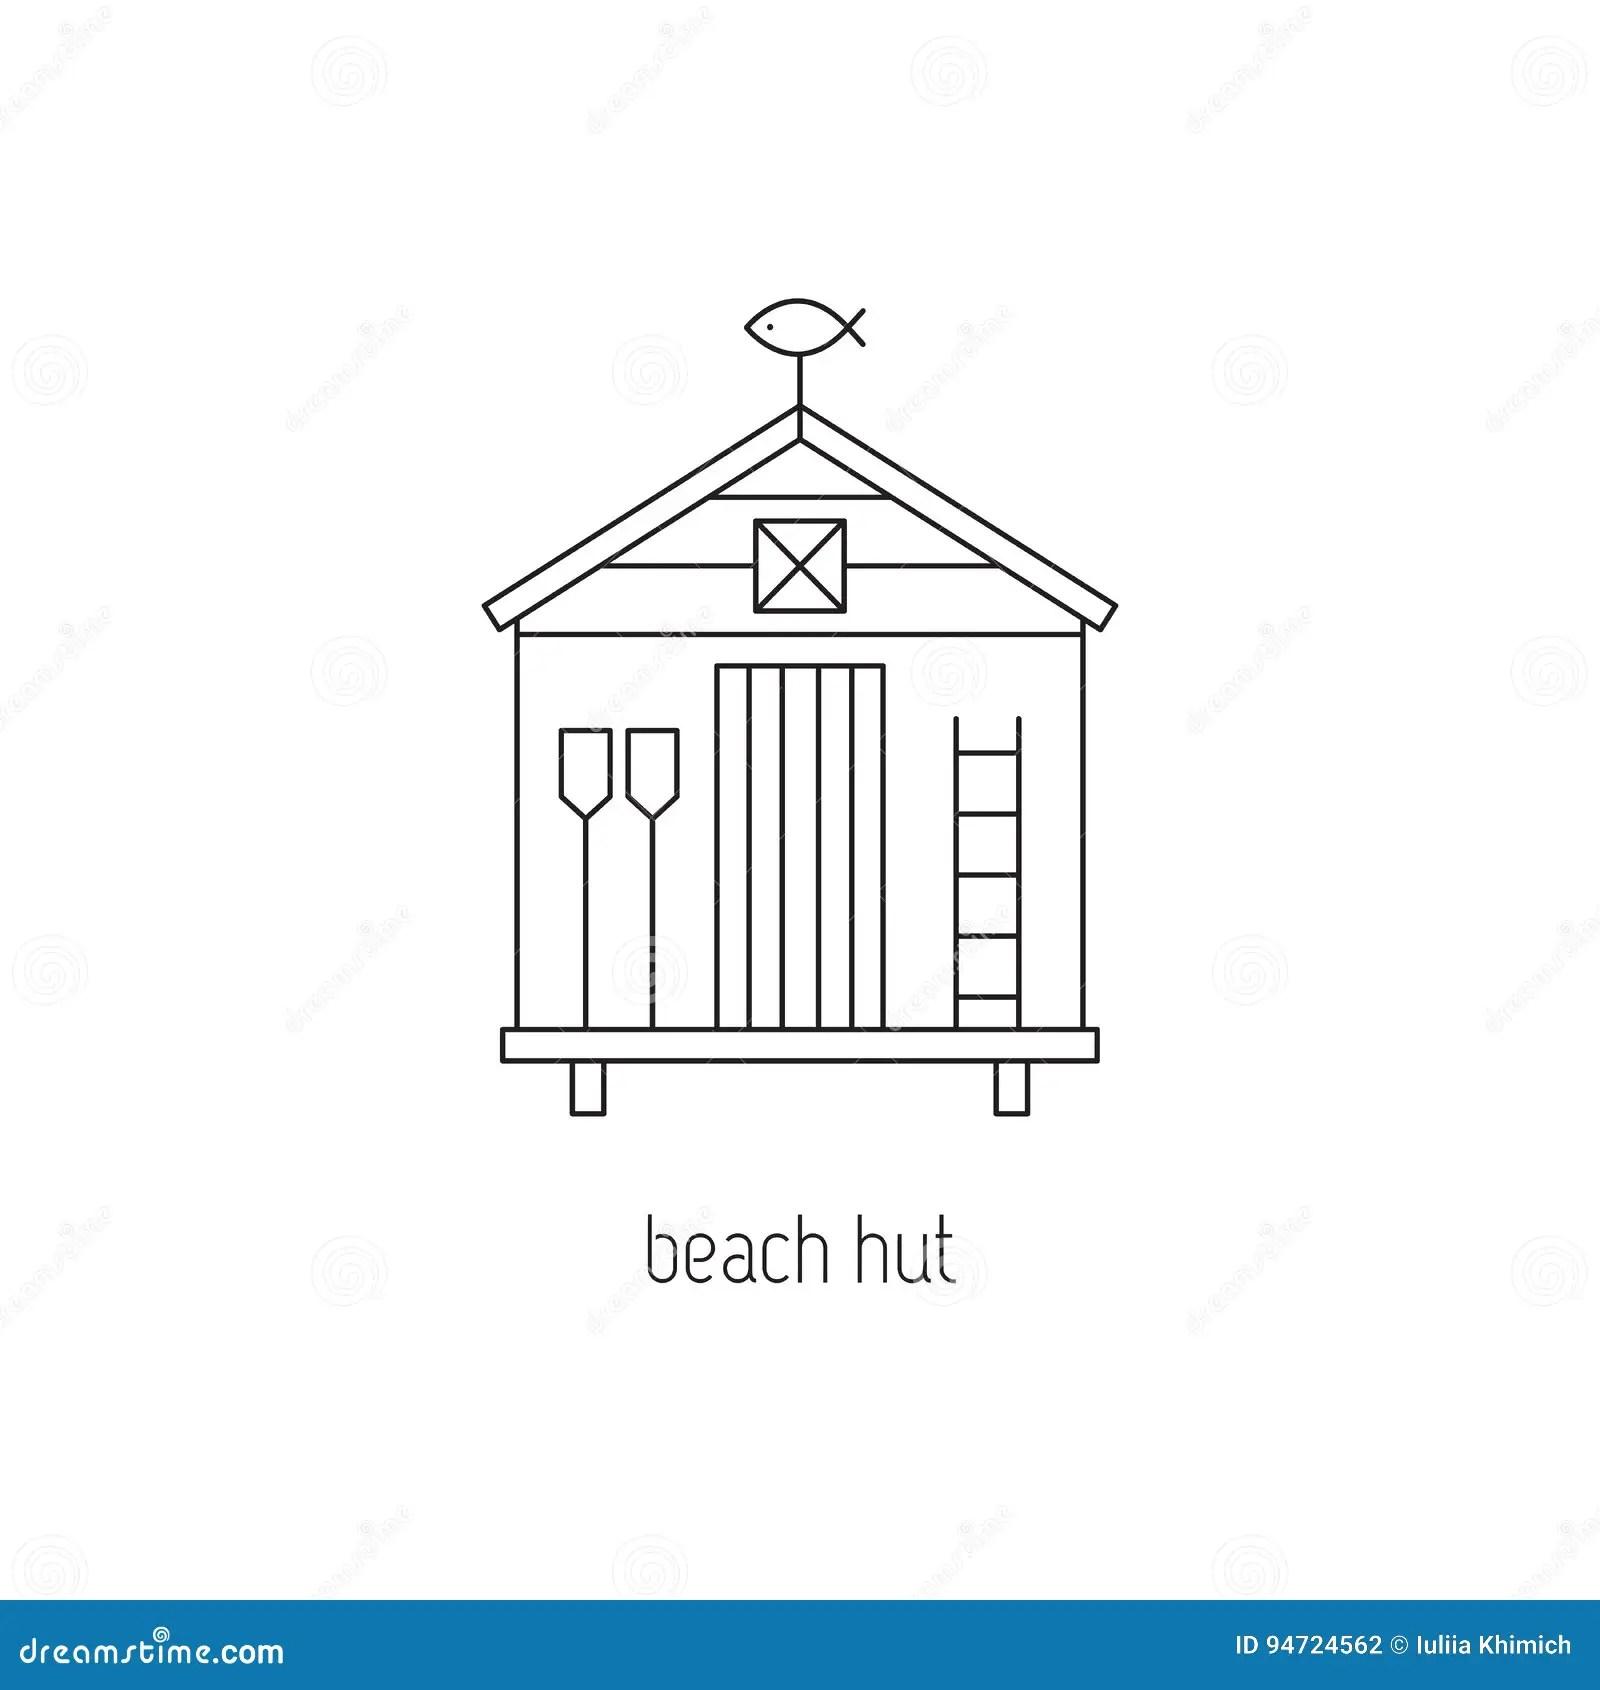 Beach hut line icon stock vector. Illustration of shack